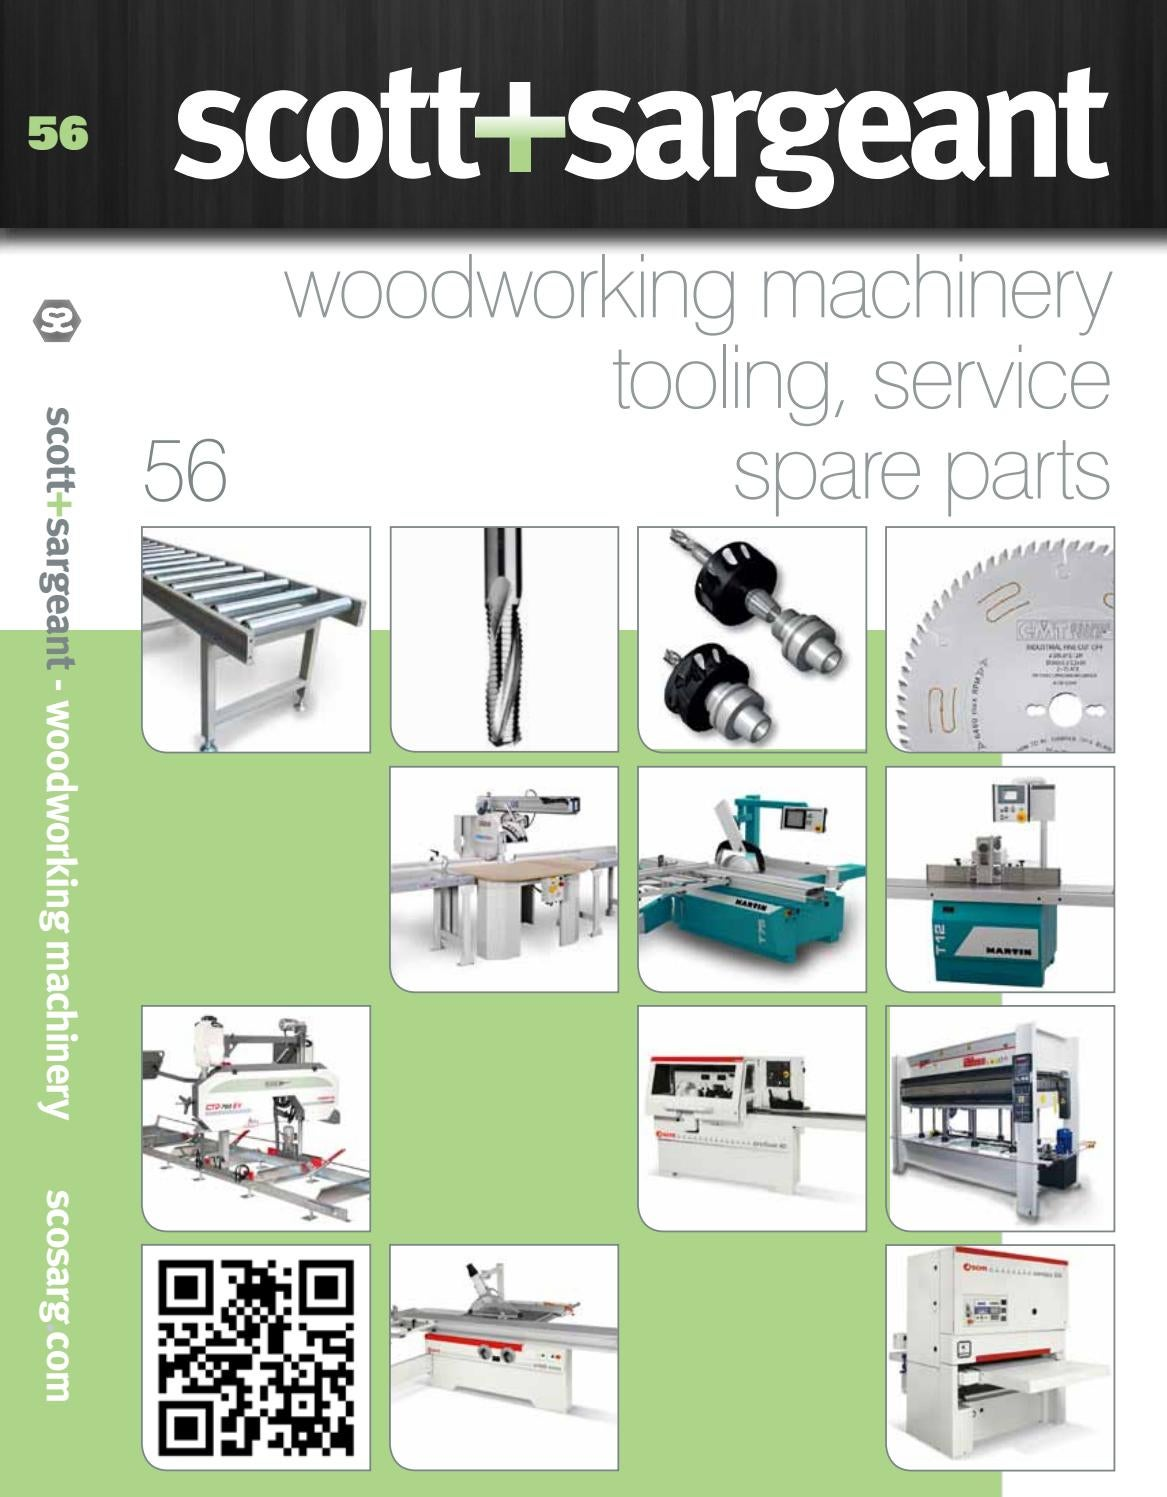 hight resolution of scott sargeant woodworking machinery catalogue 56 by scott sargeant woodworking machinery issuu